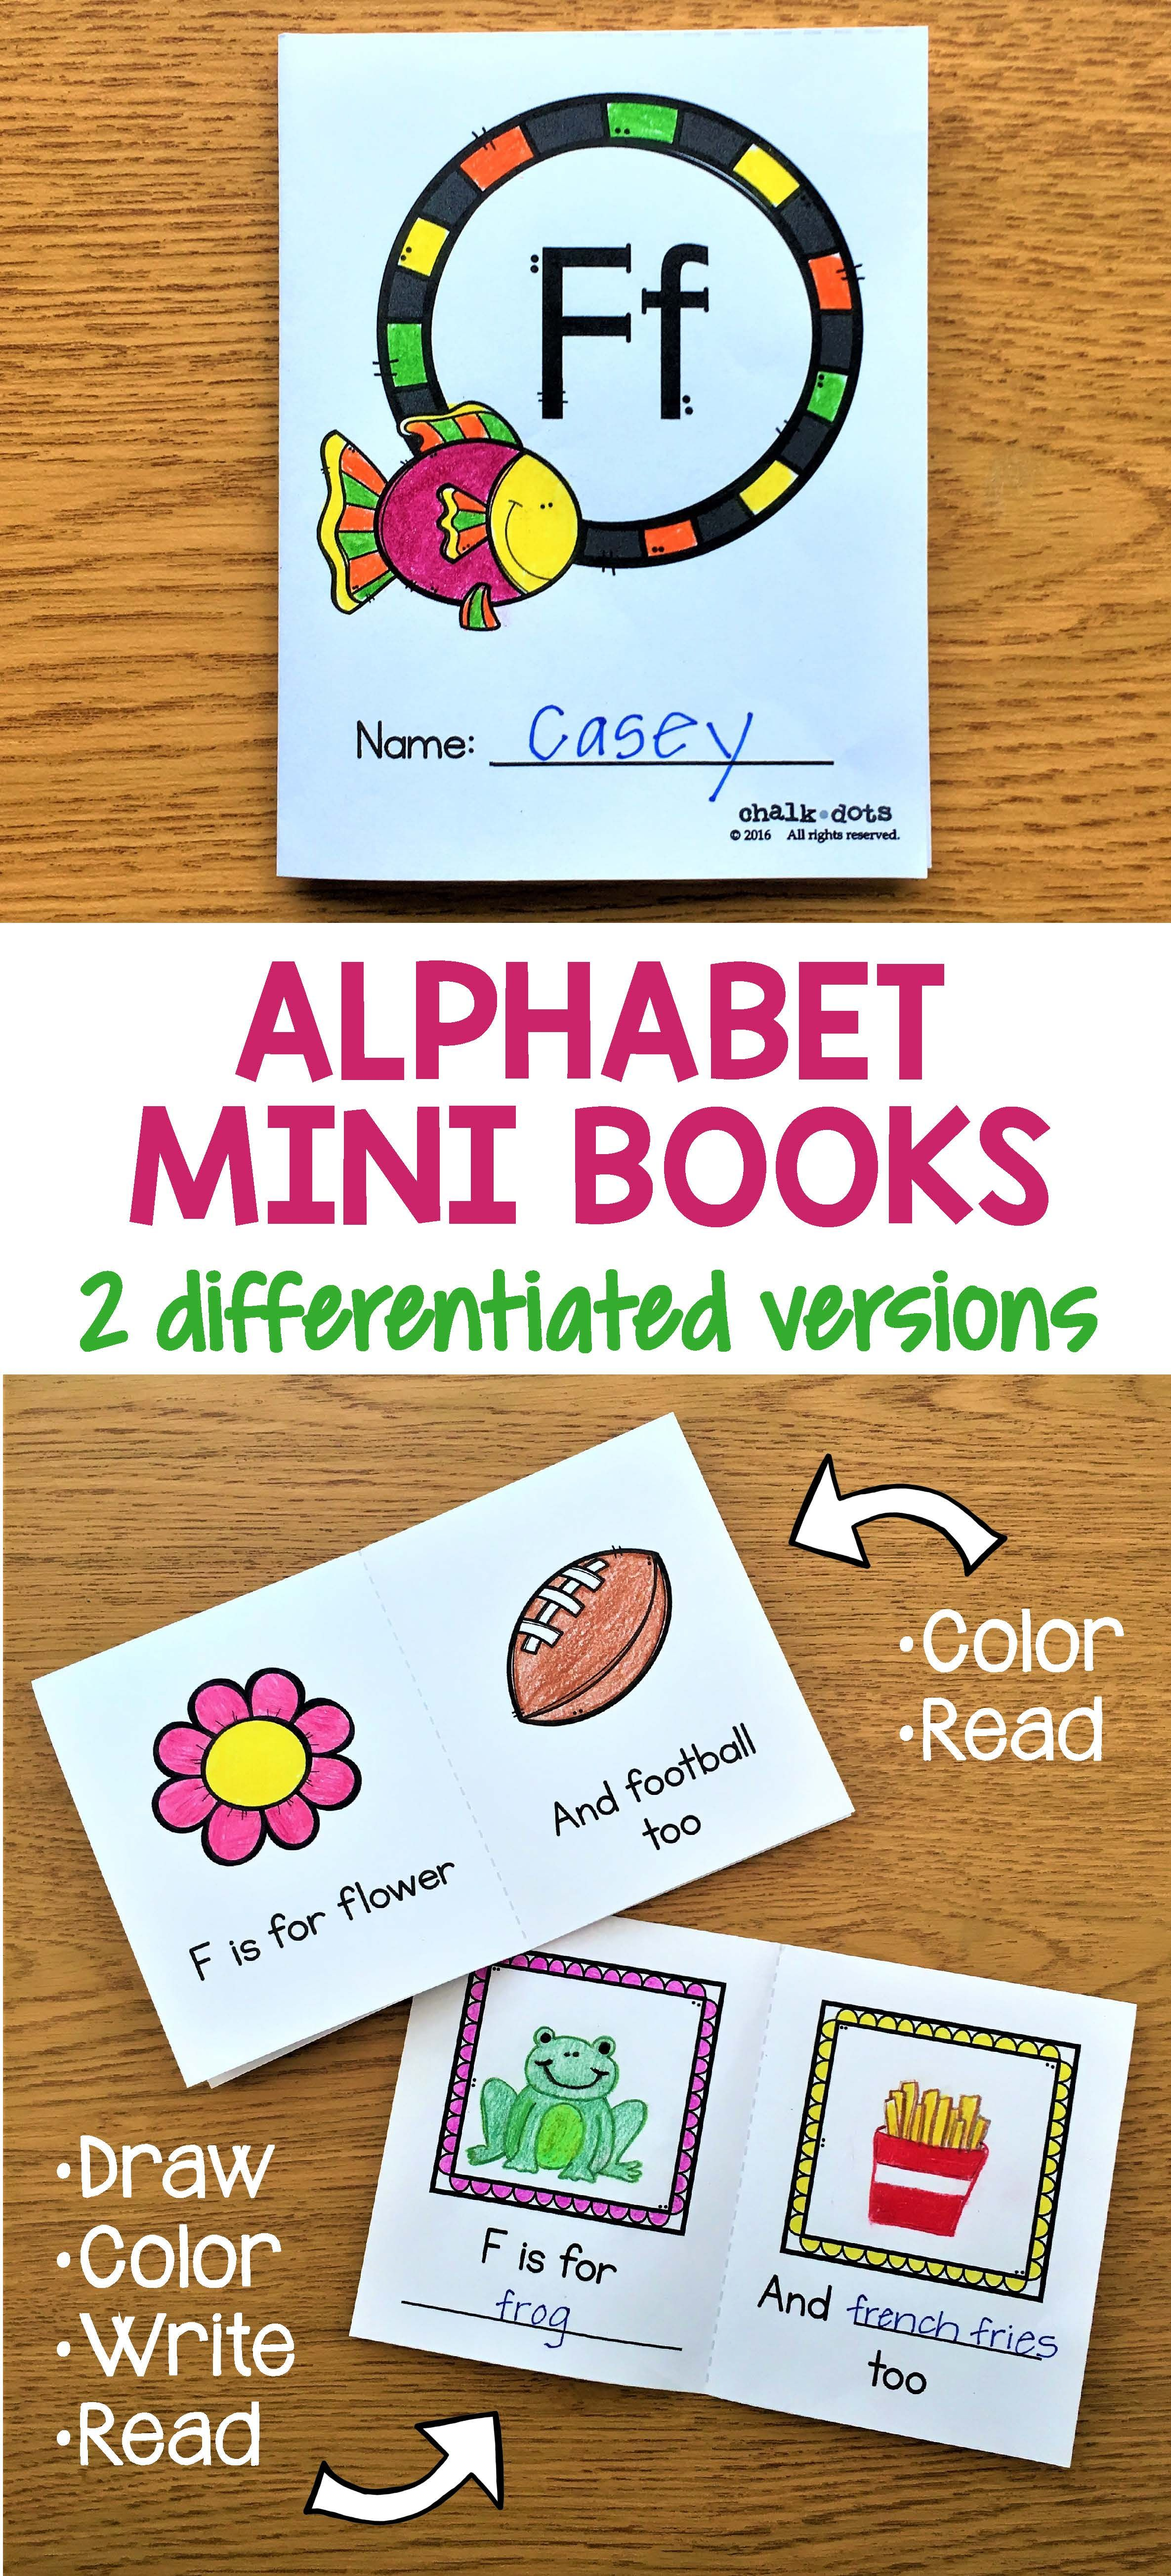 Alphabet Mini Books Alphabet Mini Book Mini Books Teaching The Alphabet [ 5214 x 2370 Pixel ]